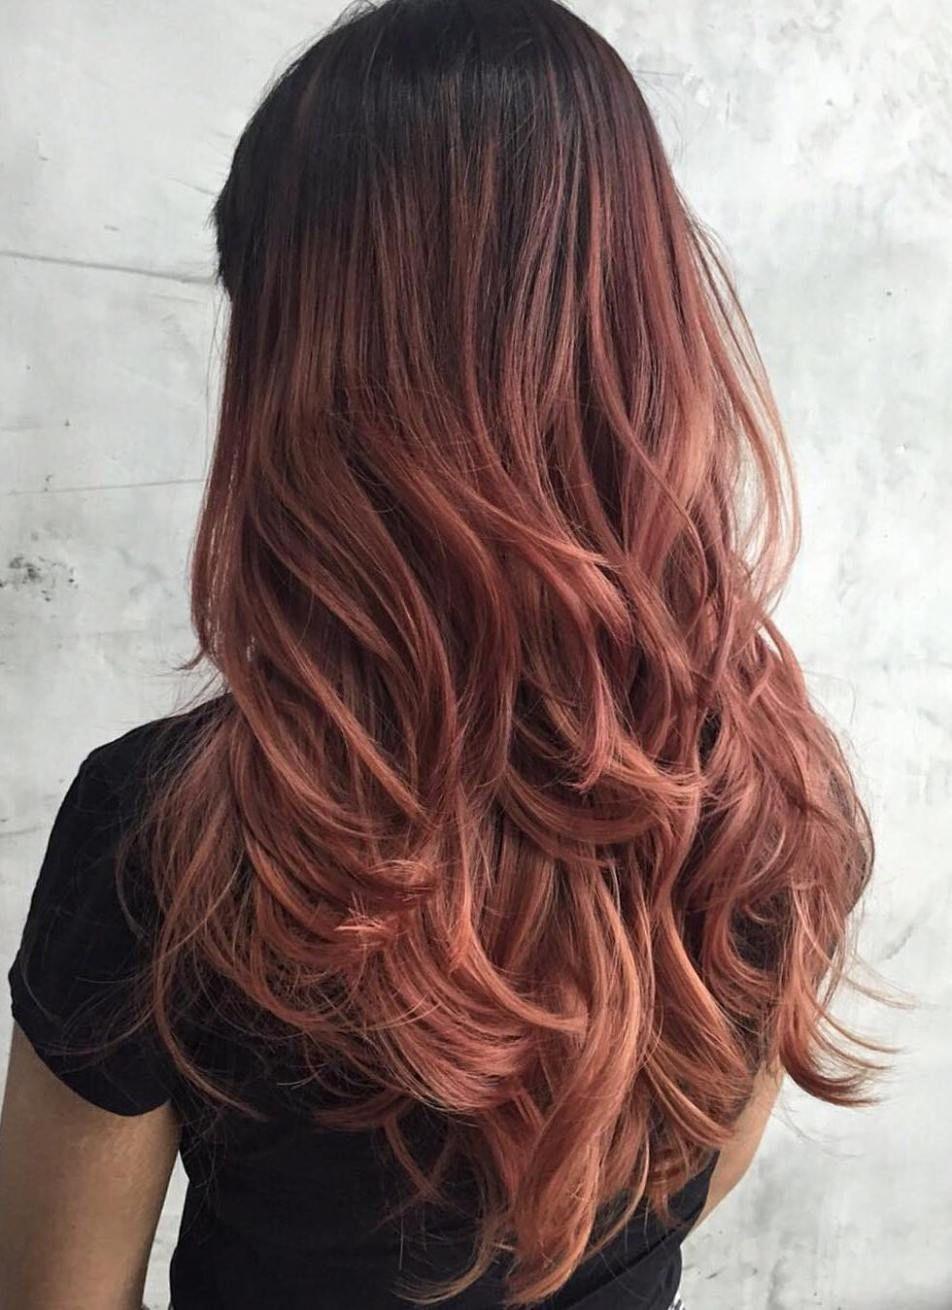 medium brown hair with blonde highlights